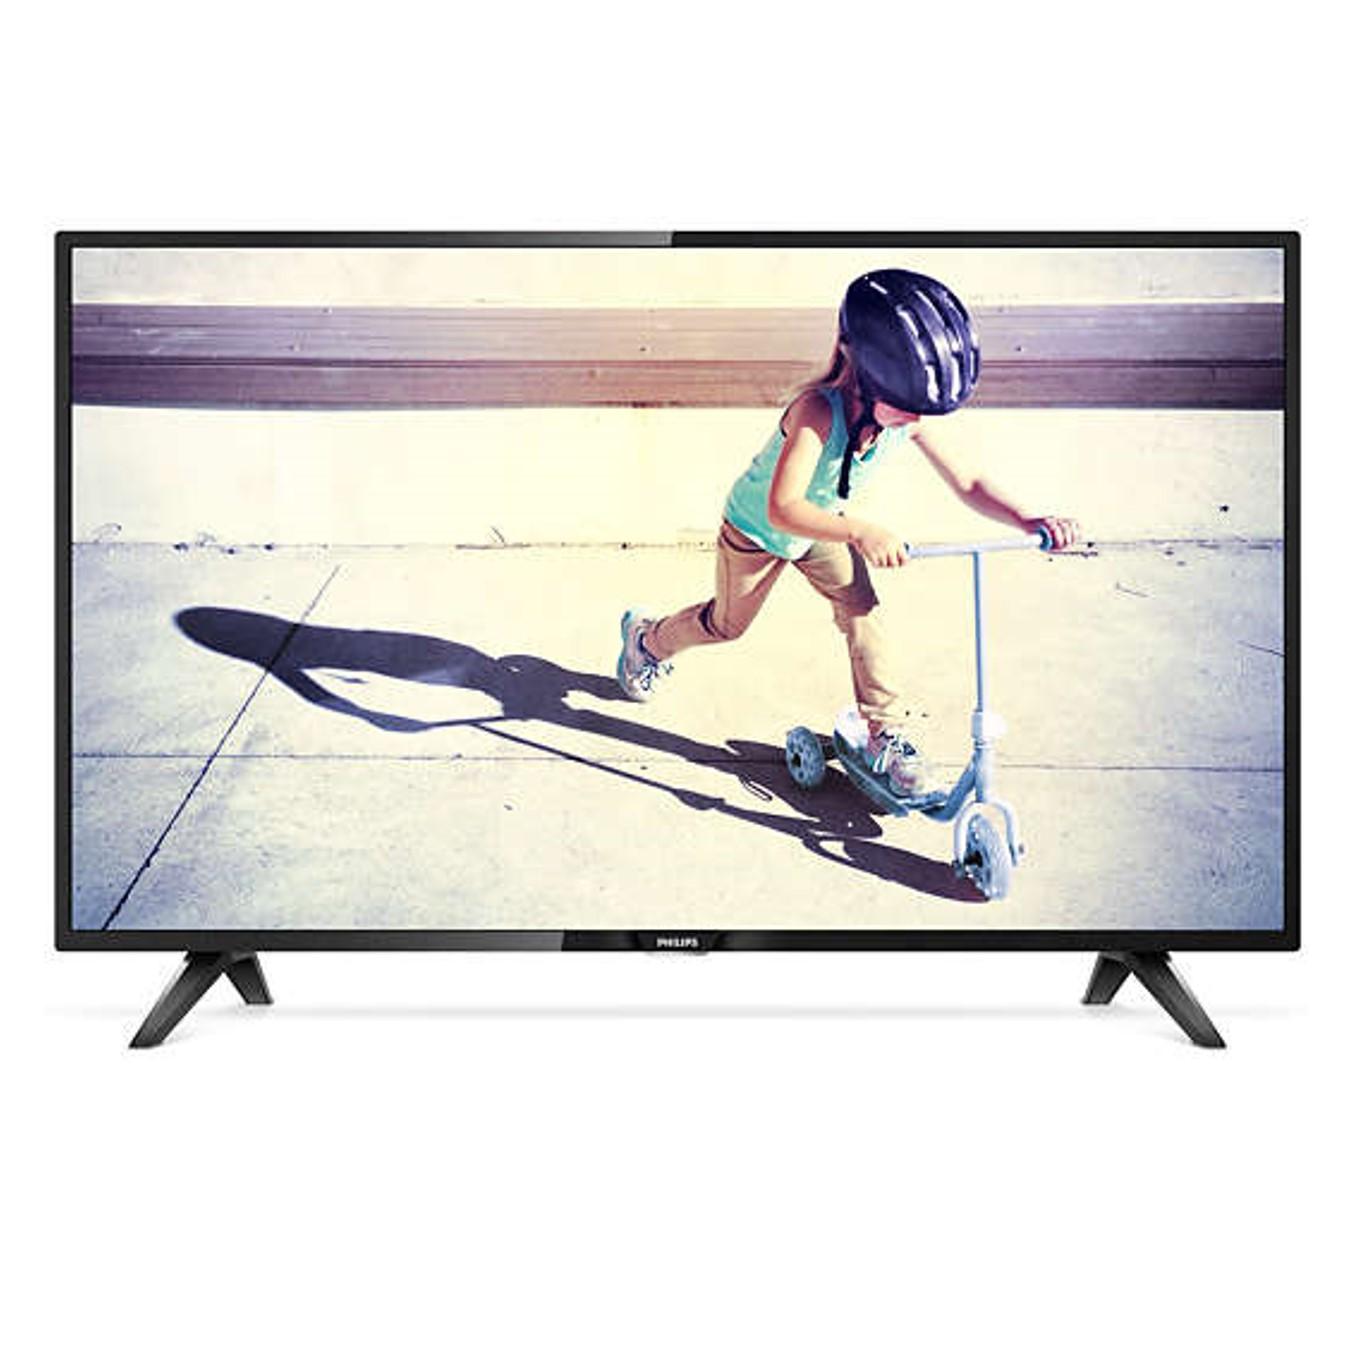 Led-tv-philips-43-034-43pft4112-full-hd-ultra-slim